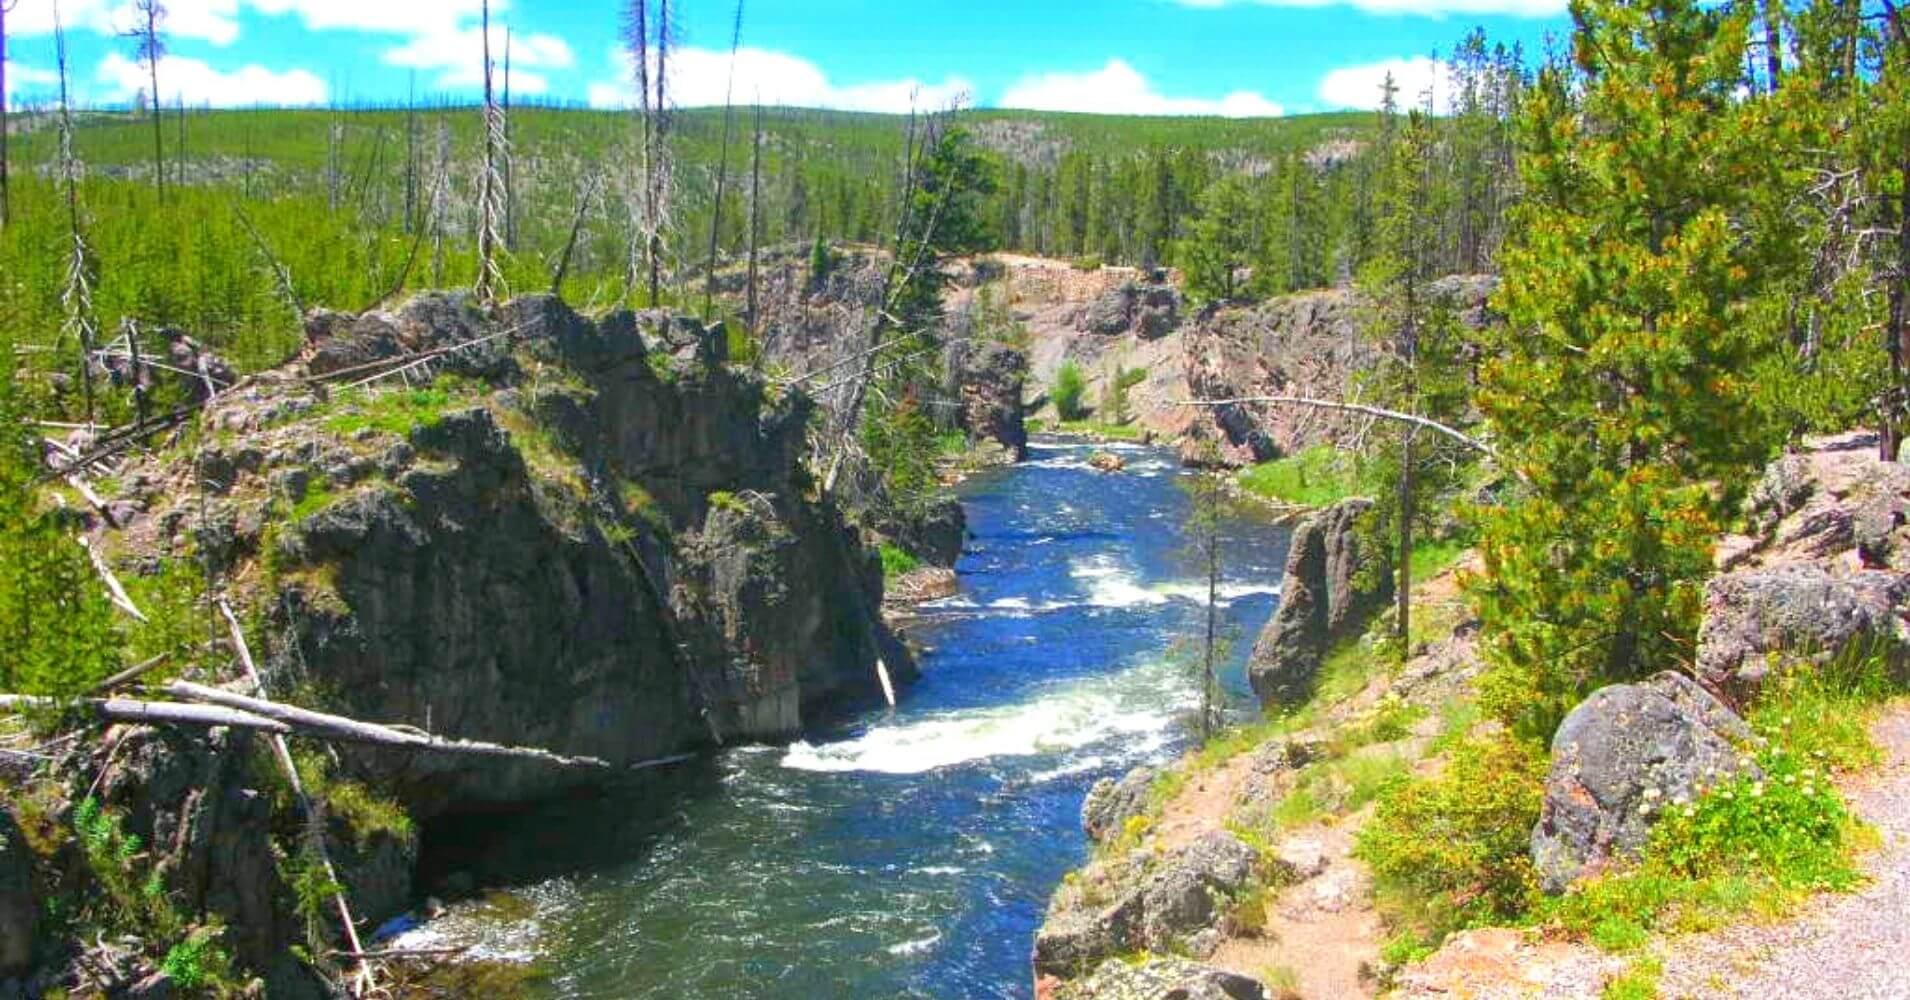 Río Yellowstone. Wyoming, Estados Unidos.